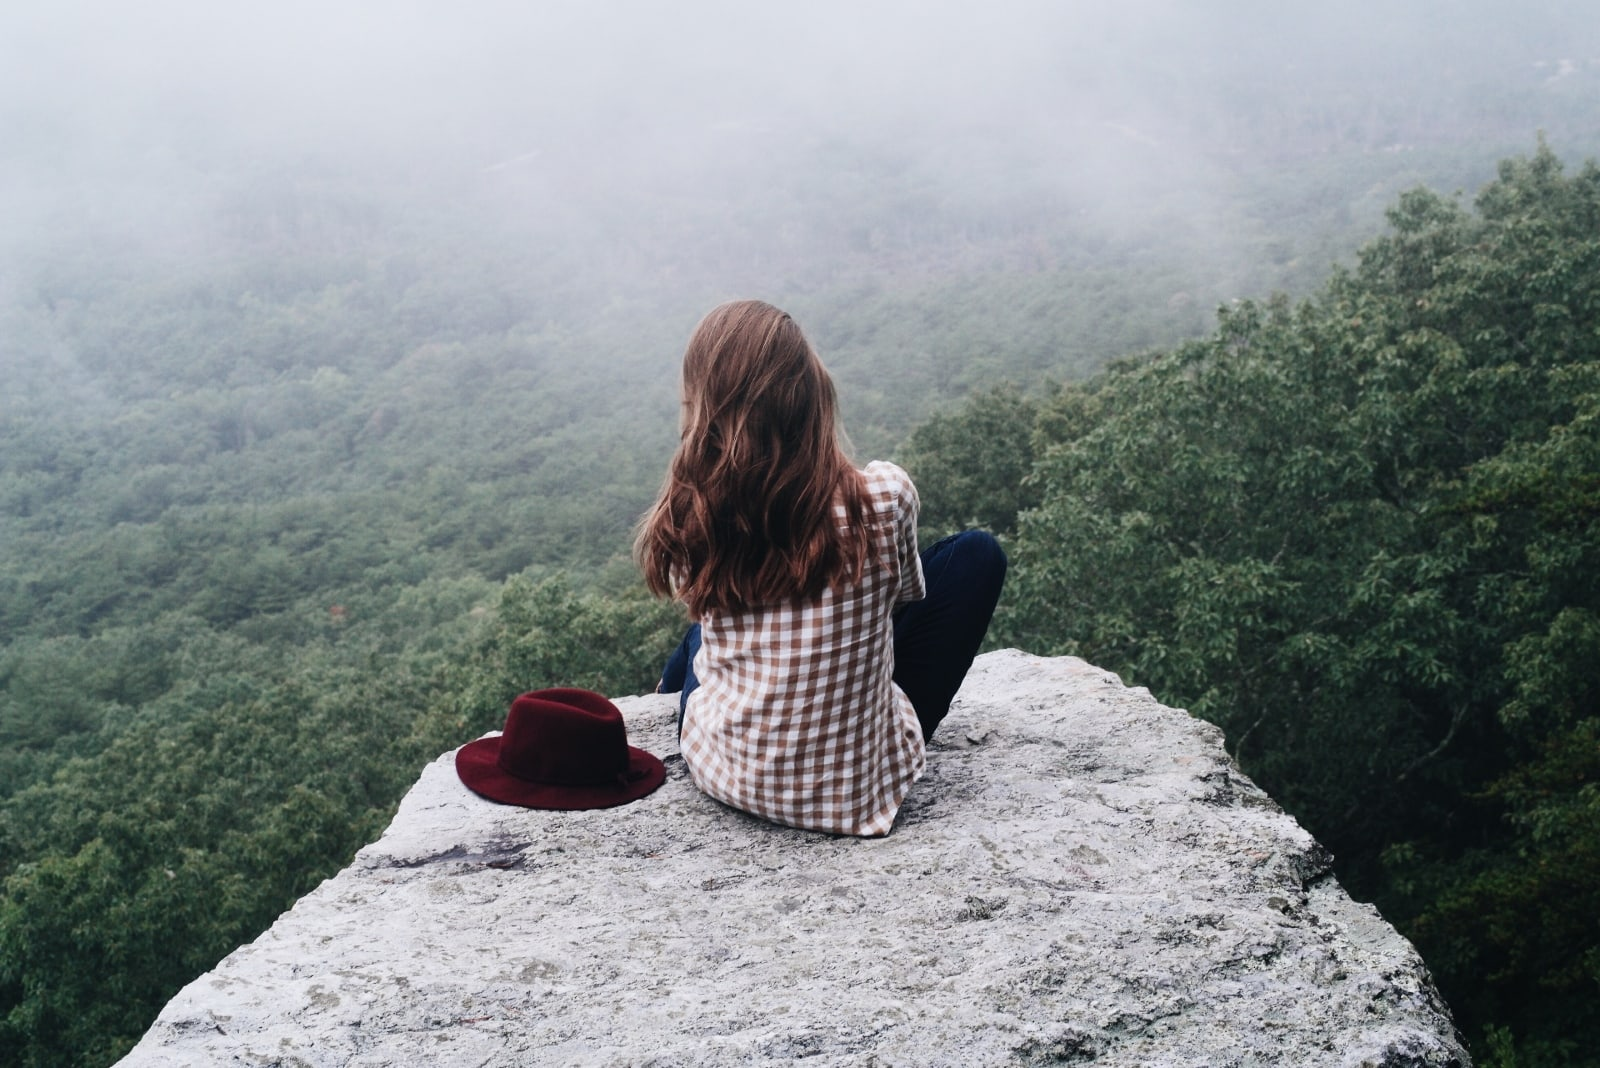 woman sitting on rock near red hat